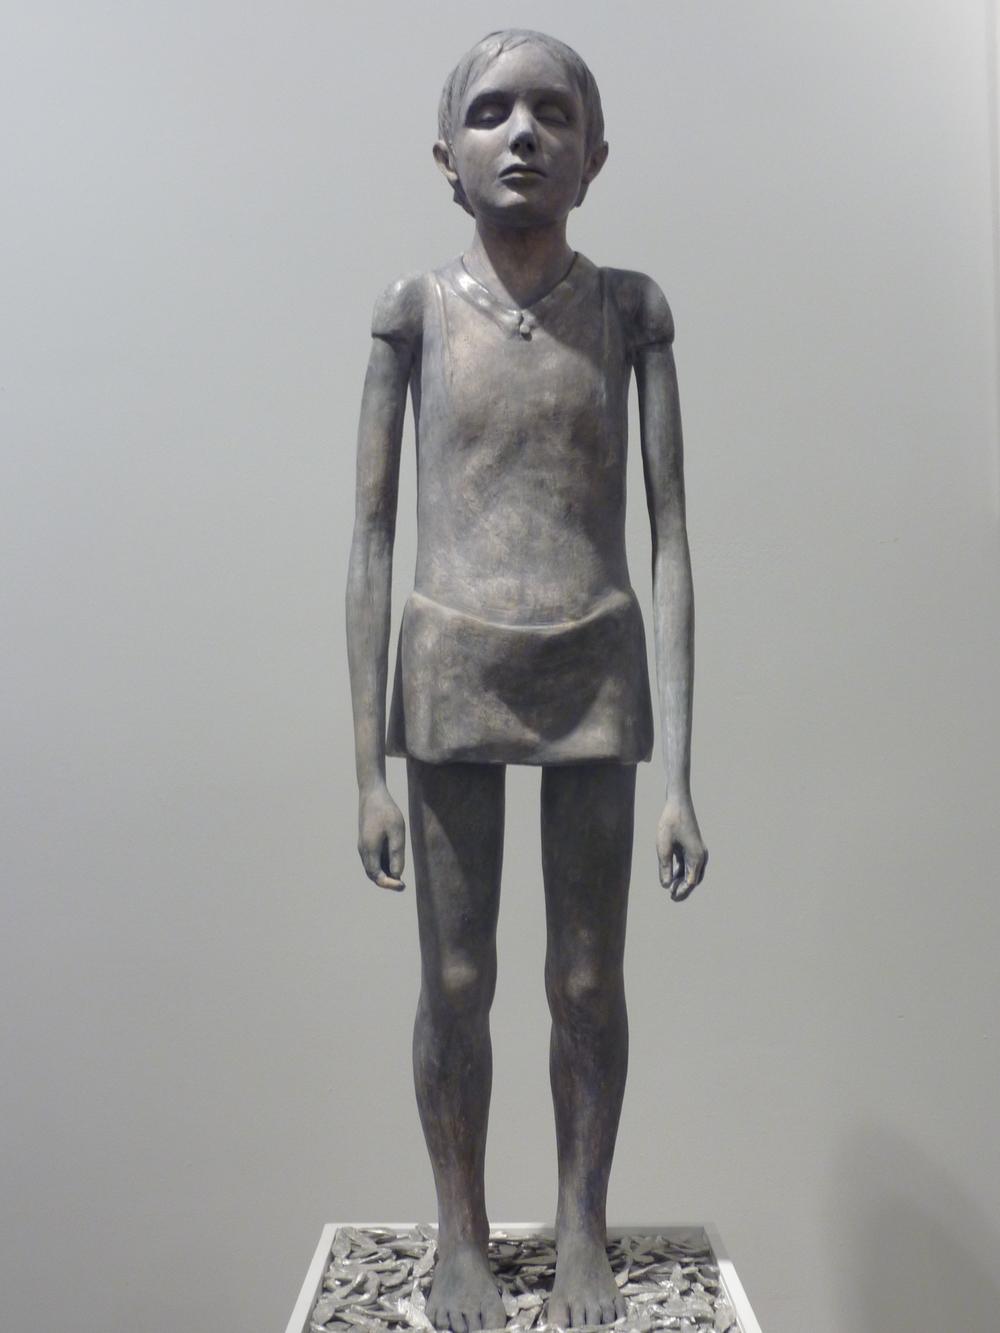 "Souvenir, 40 x 13 x 9"", Plaster, 2010"